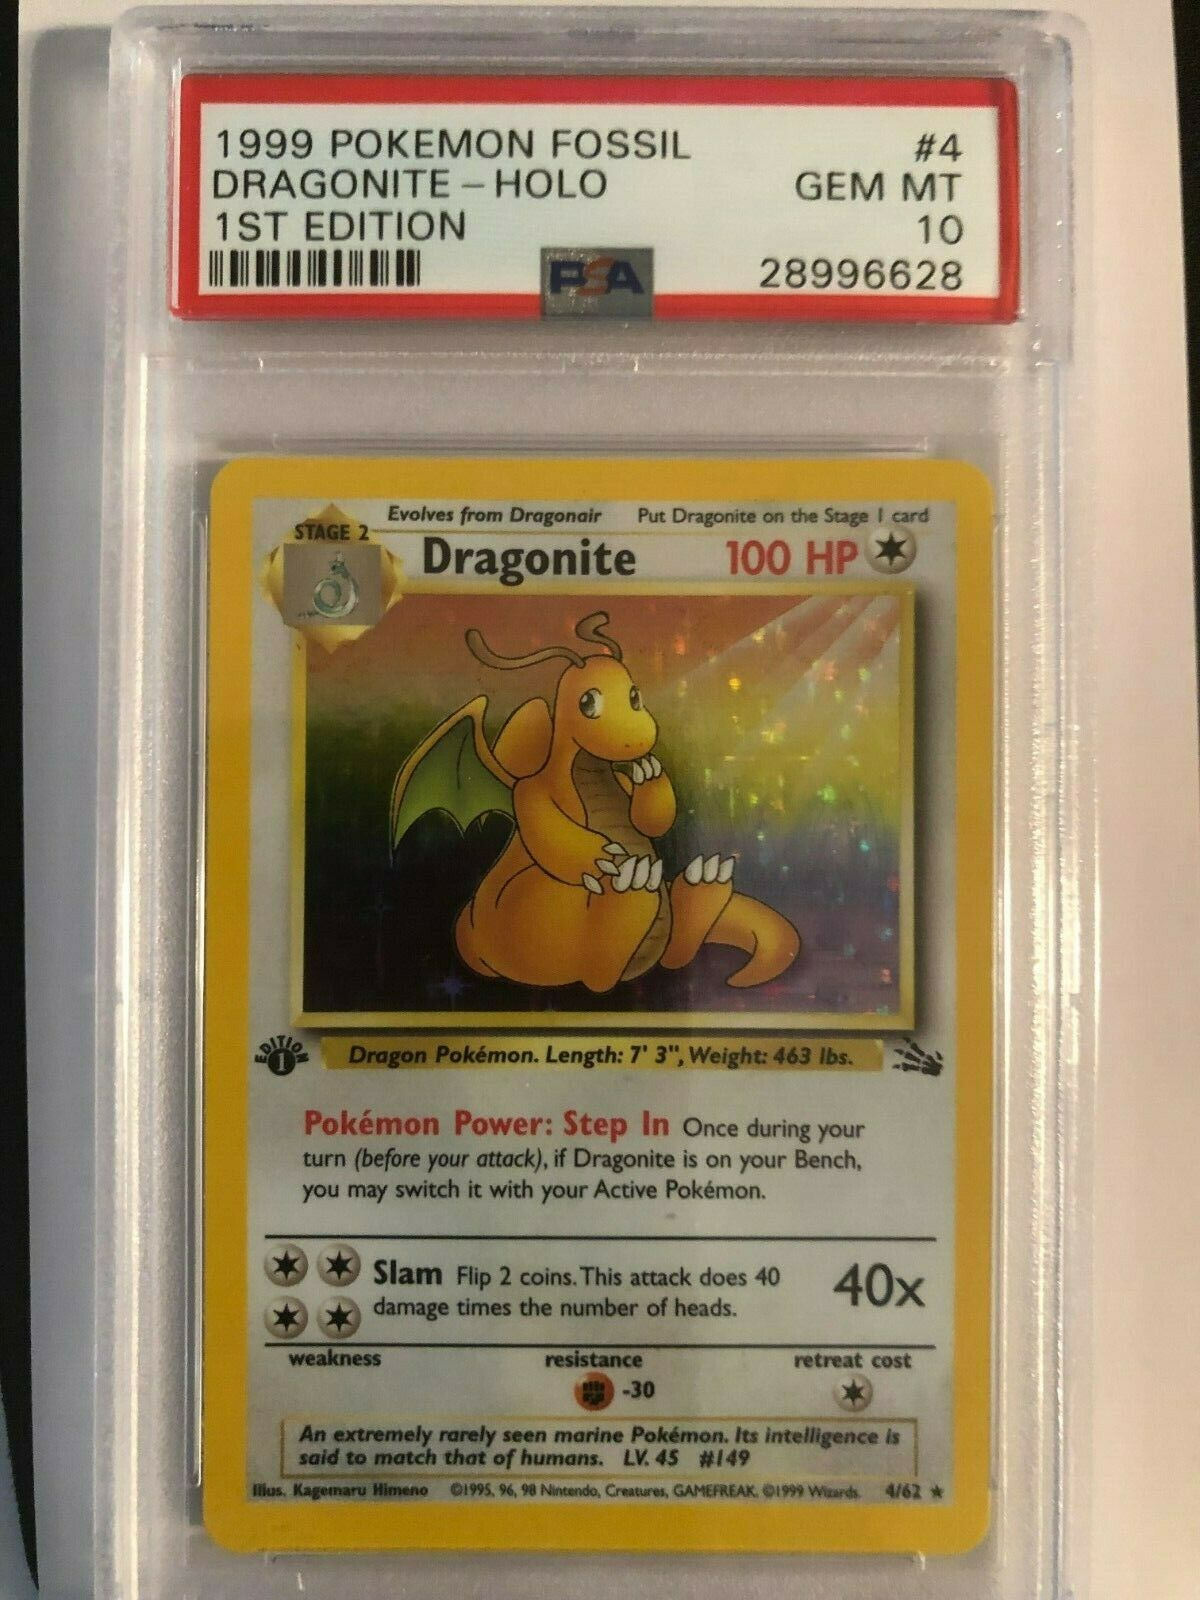 Pokemon Dragonite 1st Edition Fossil Holo 4 PSA 10 GEM MINT  Flawless Card